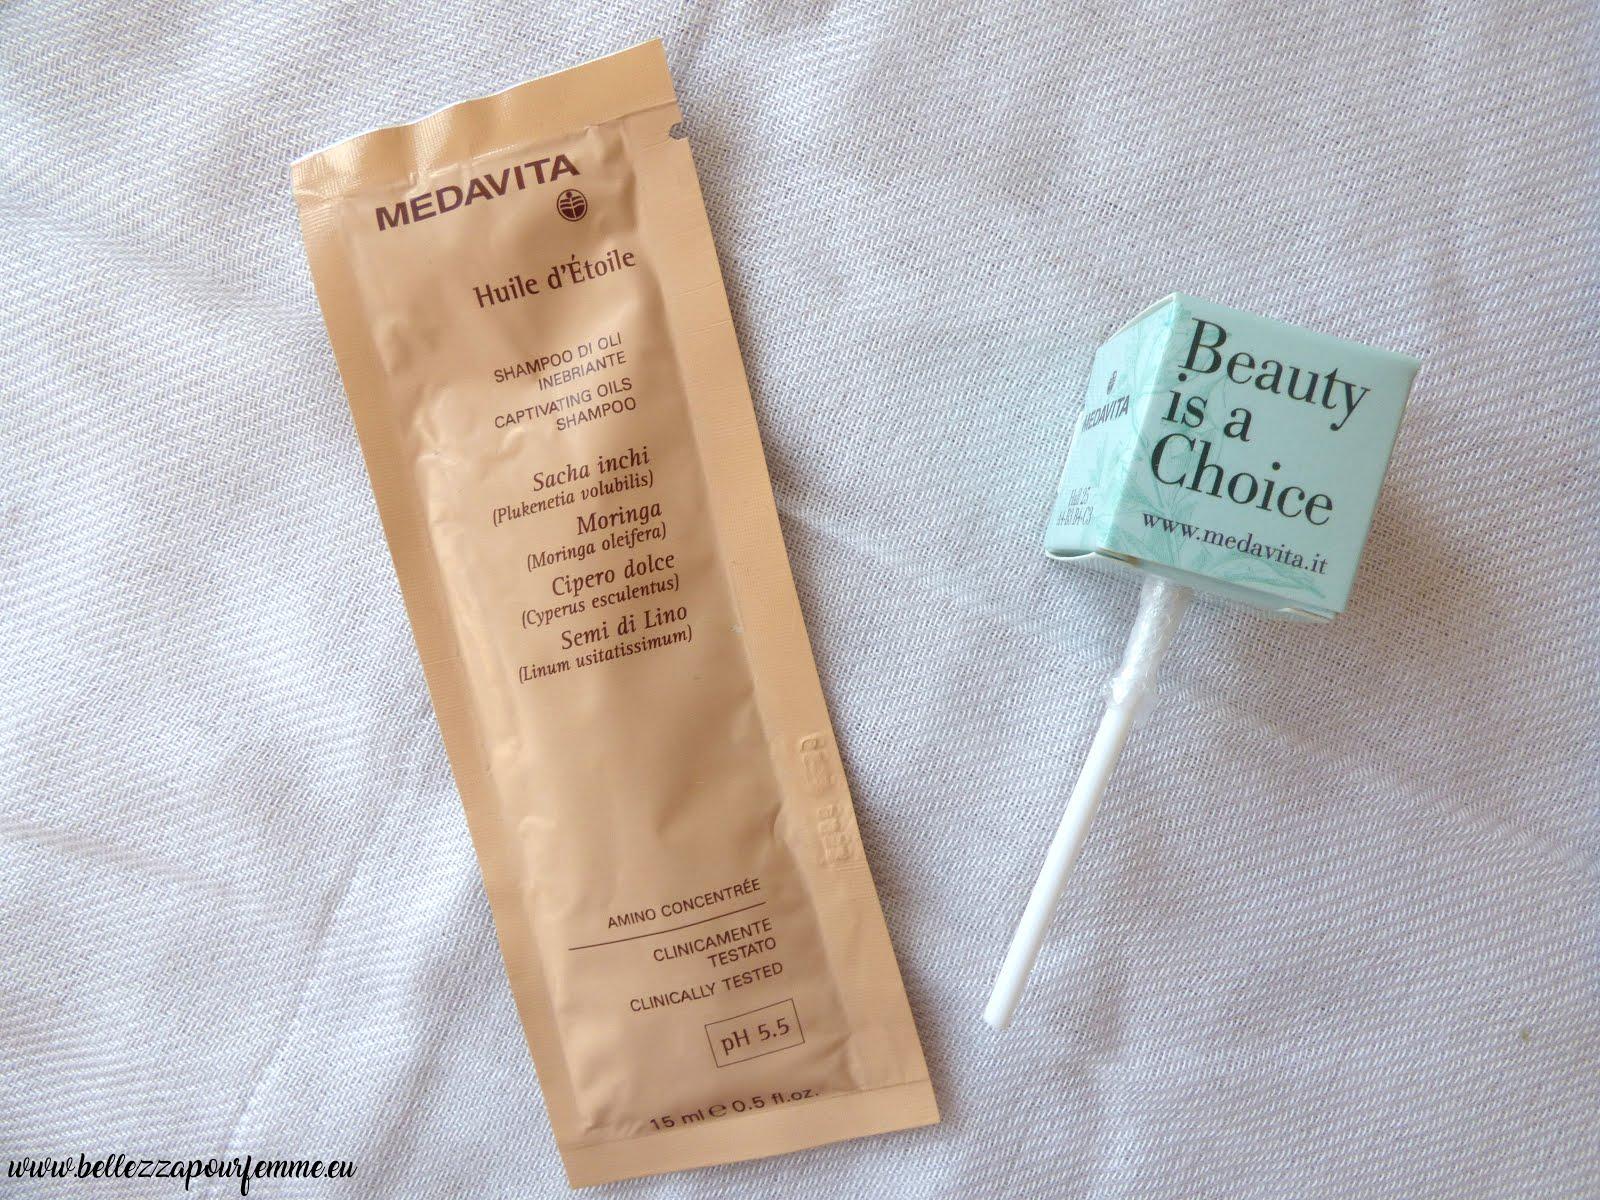 Medavita  Shampoo di Oli Inebriante pH 5.5